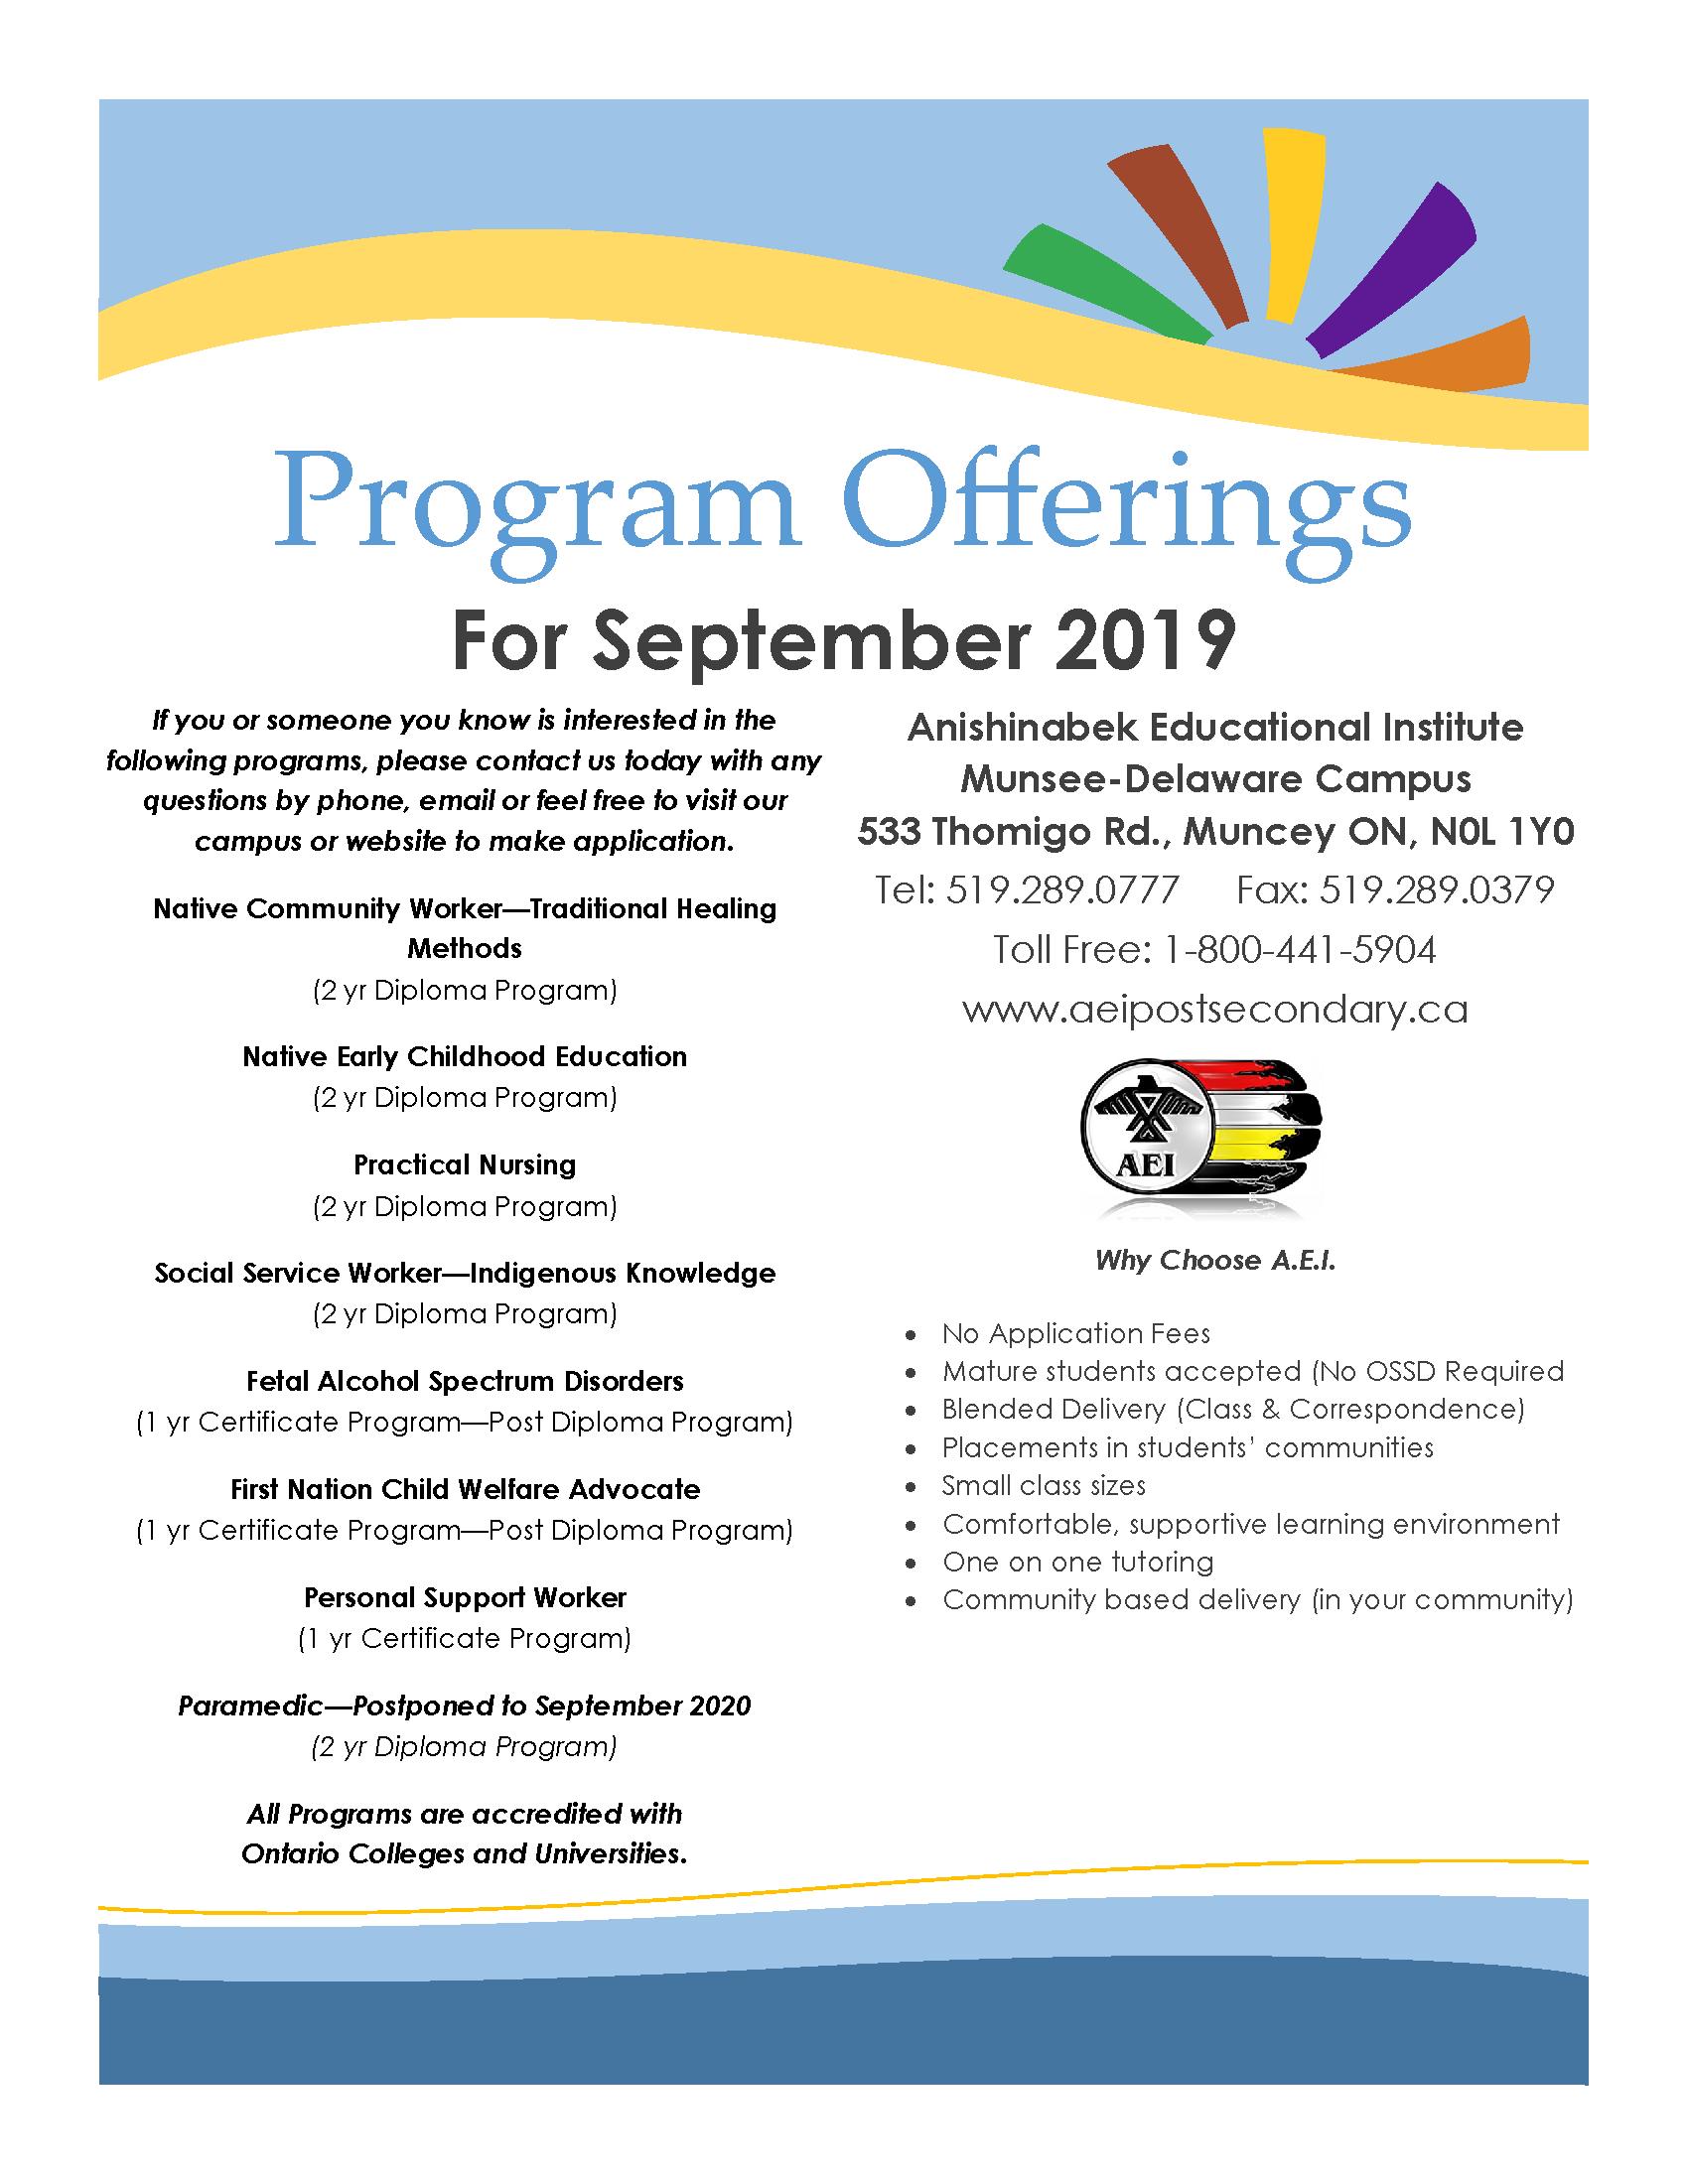 052419-intake-flyer-sept-2019-aei-md-campus